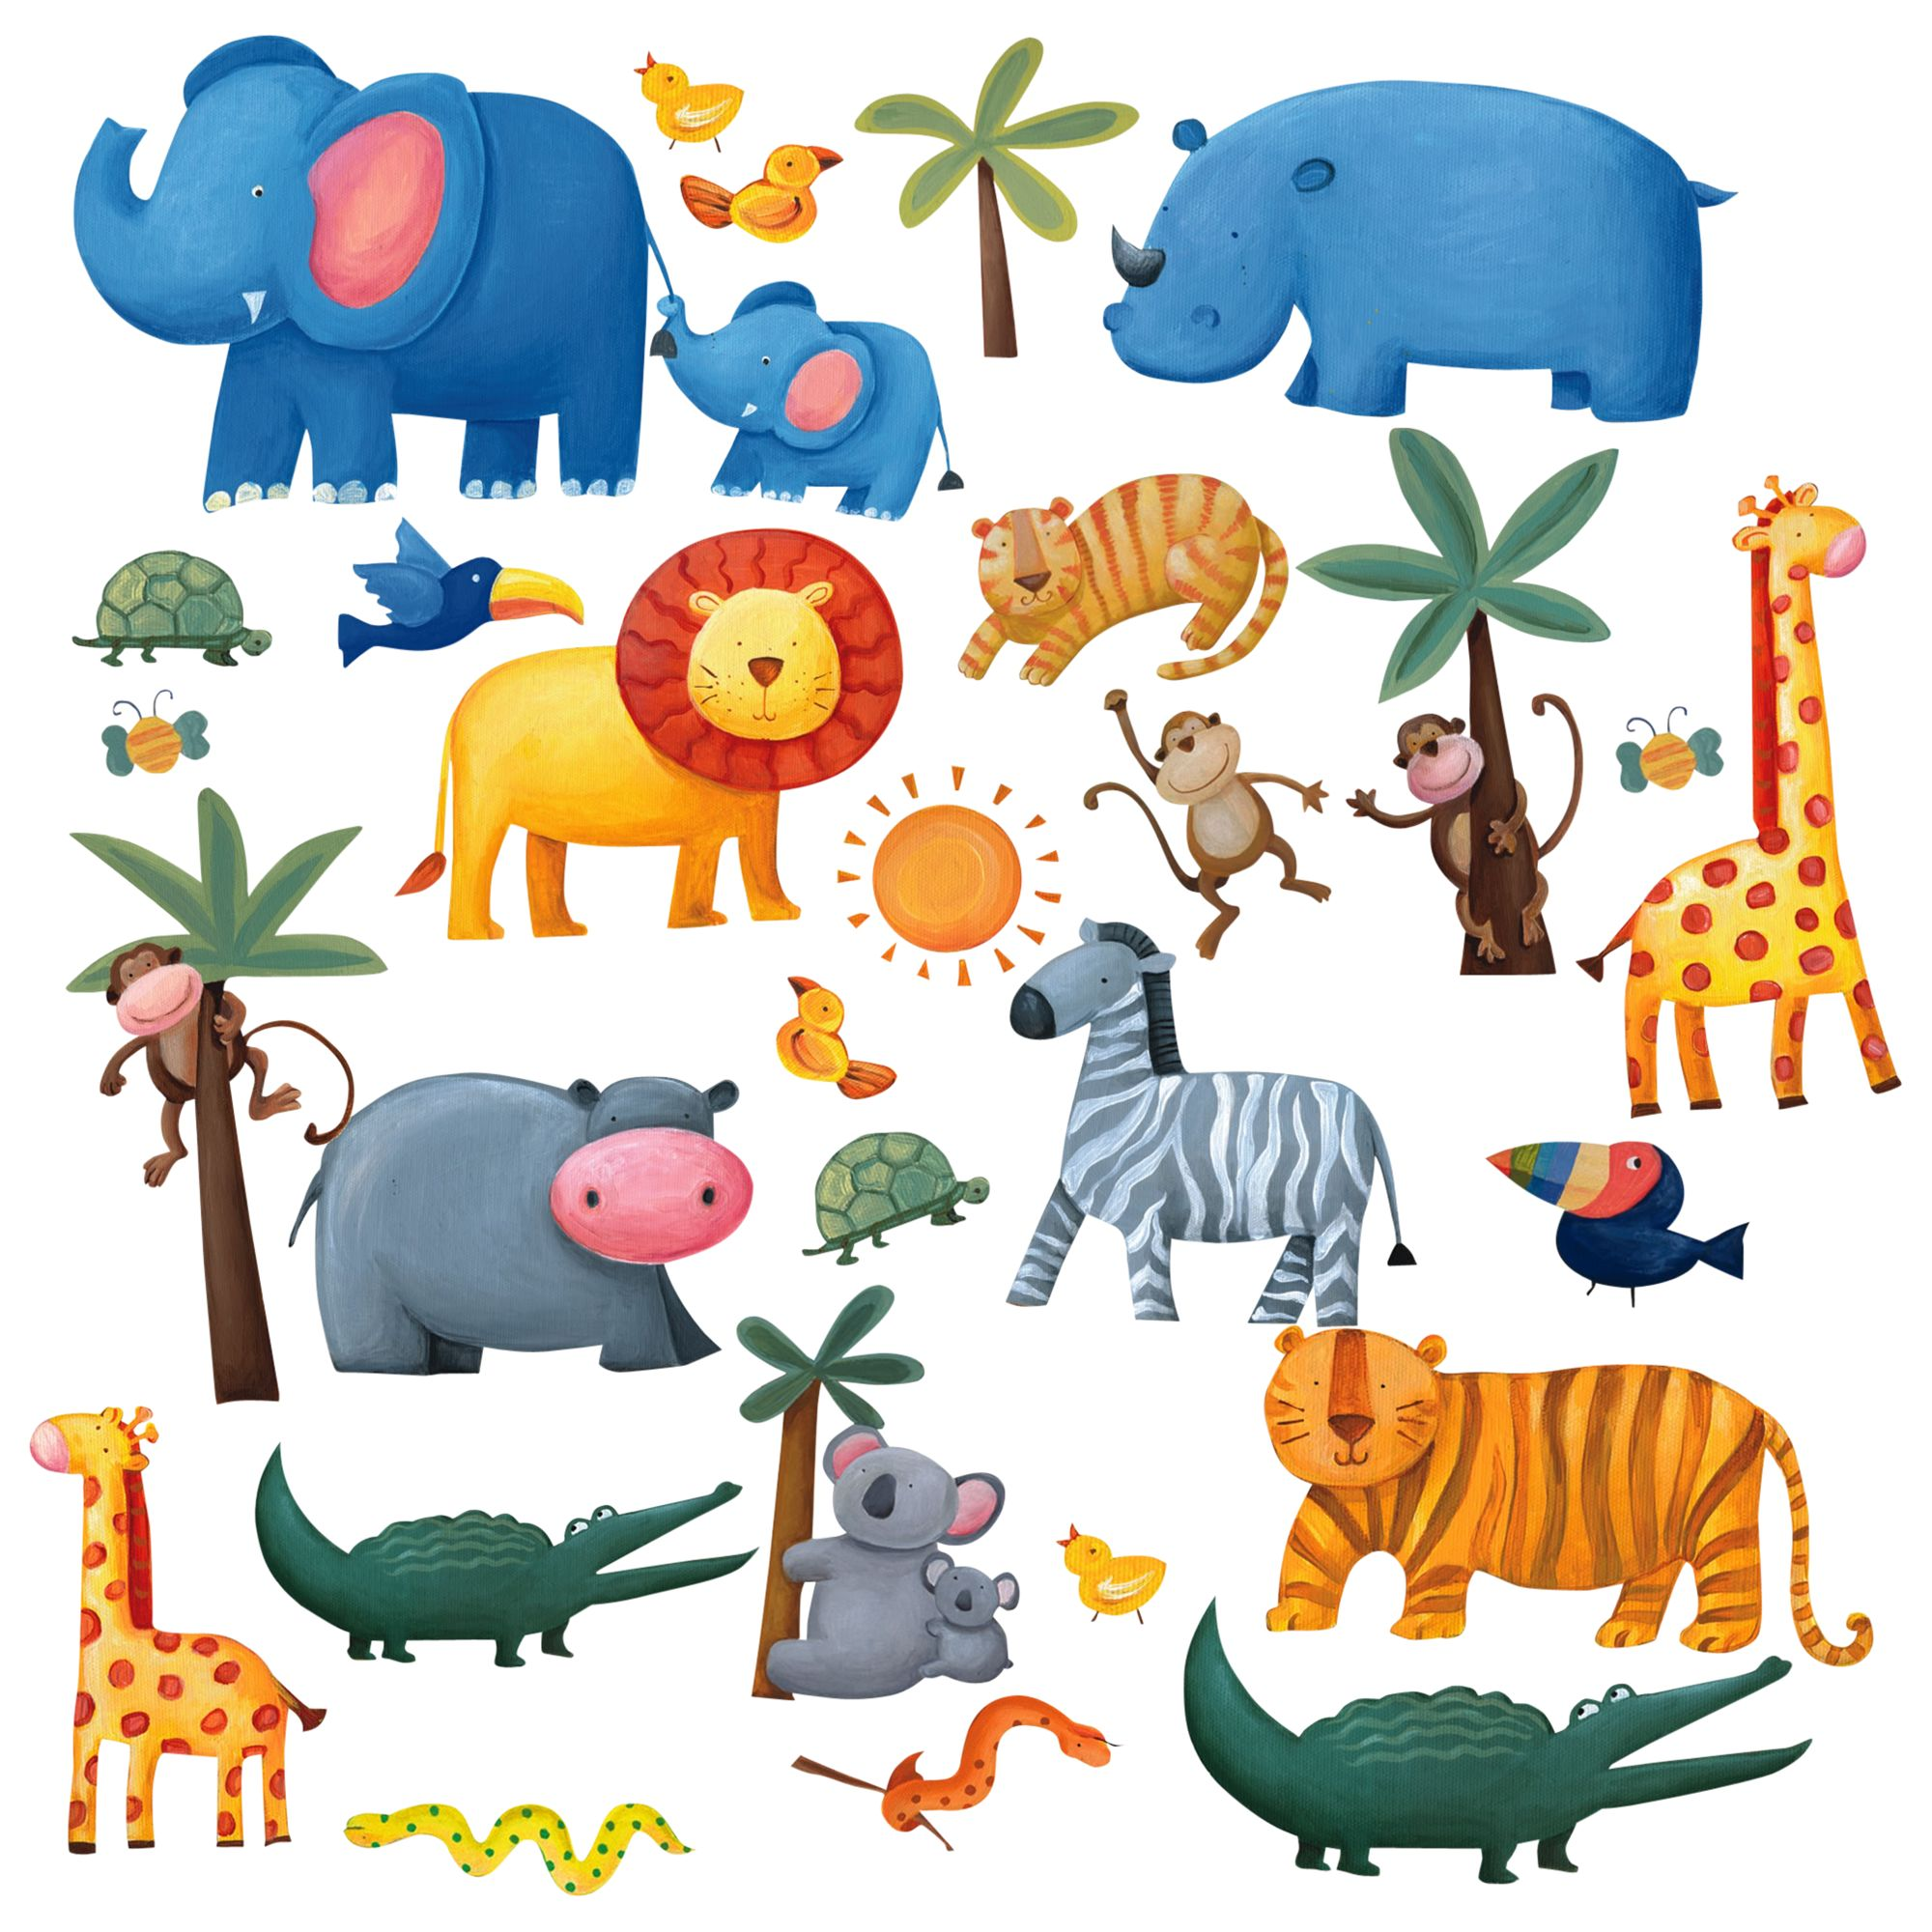 Jomoval Jomoval Jungle Adventure Wall Stickers